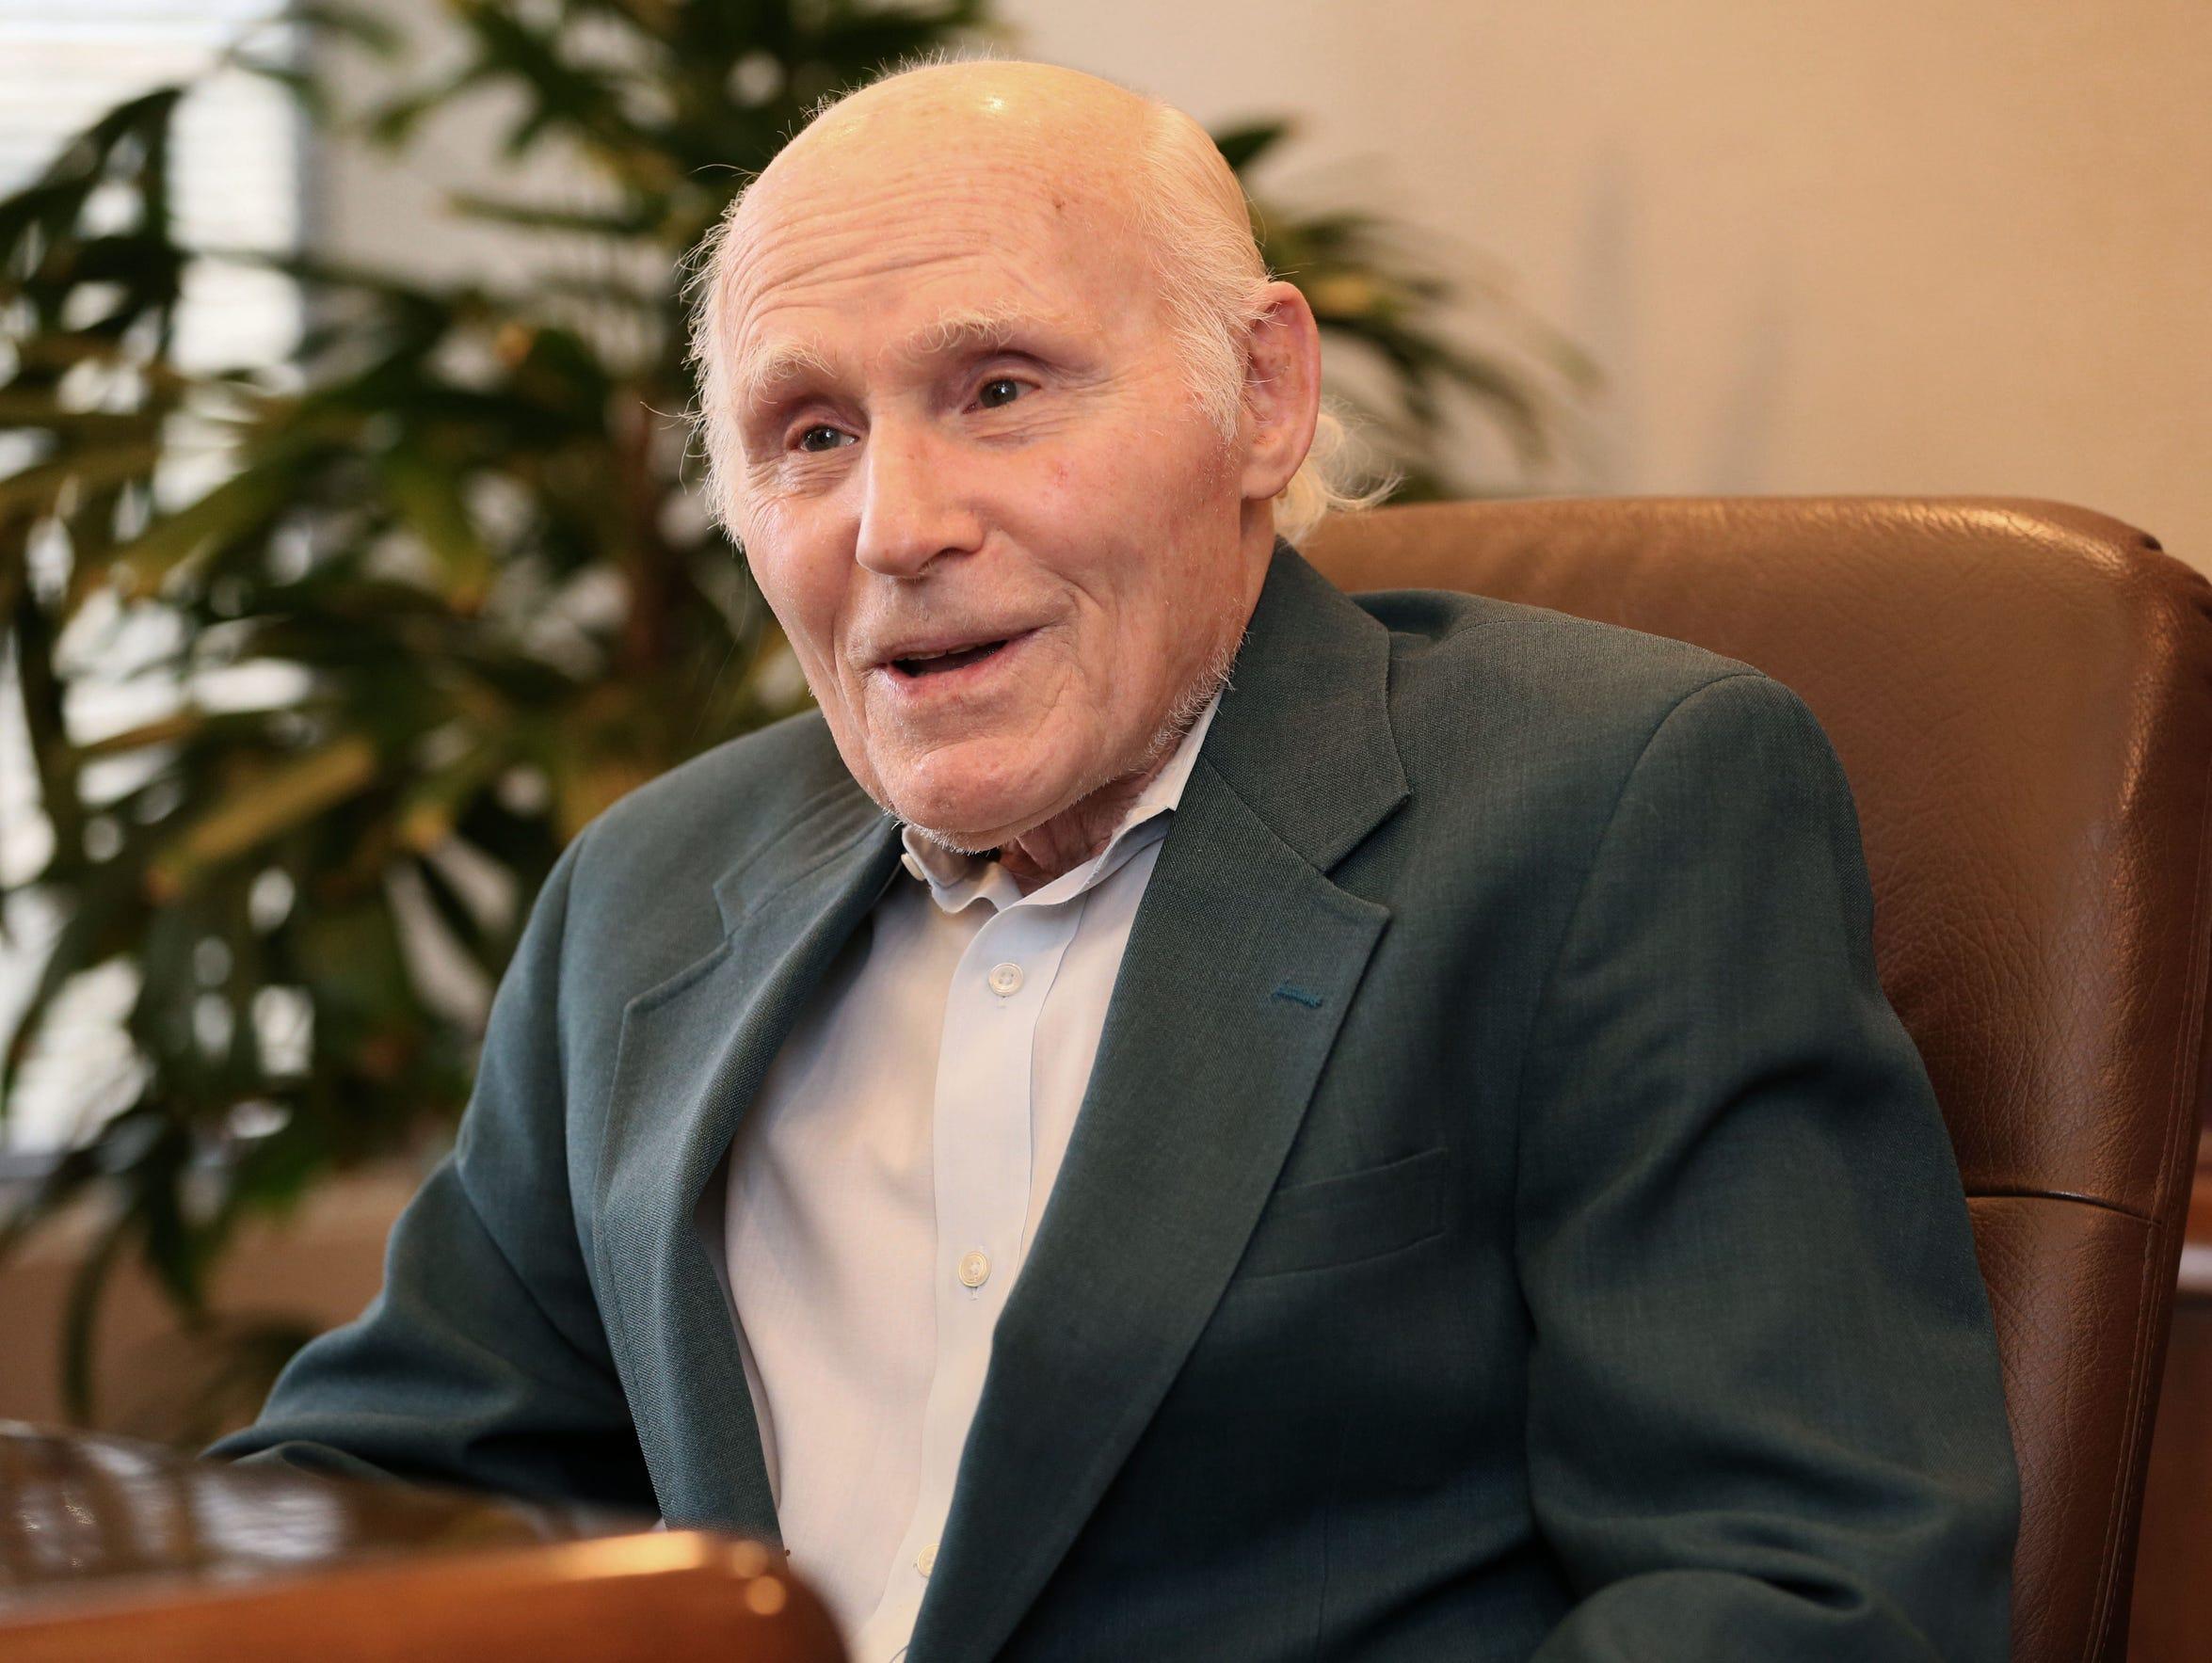 Herb Kohl, former U.S. senator and longtime owner of